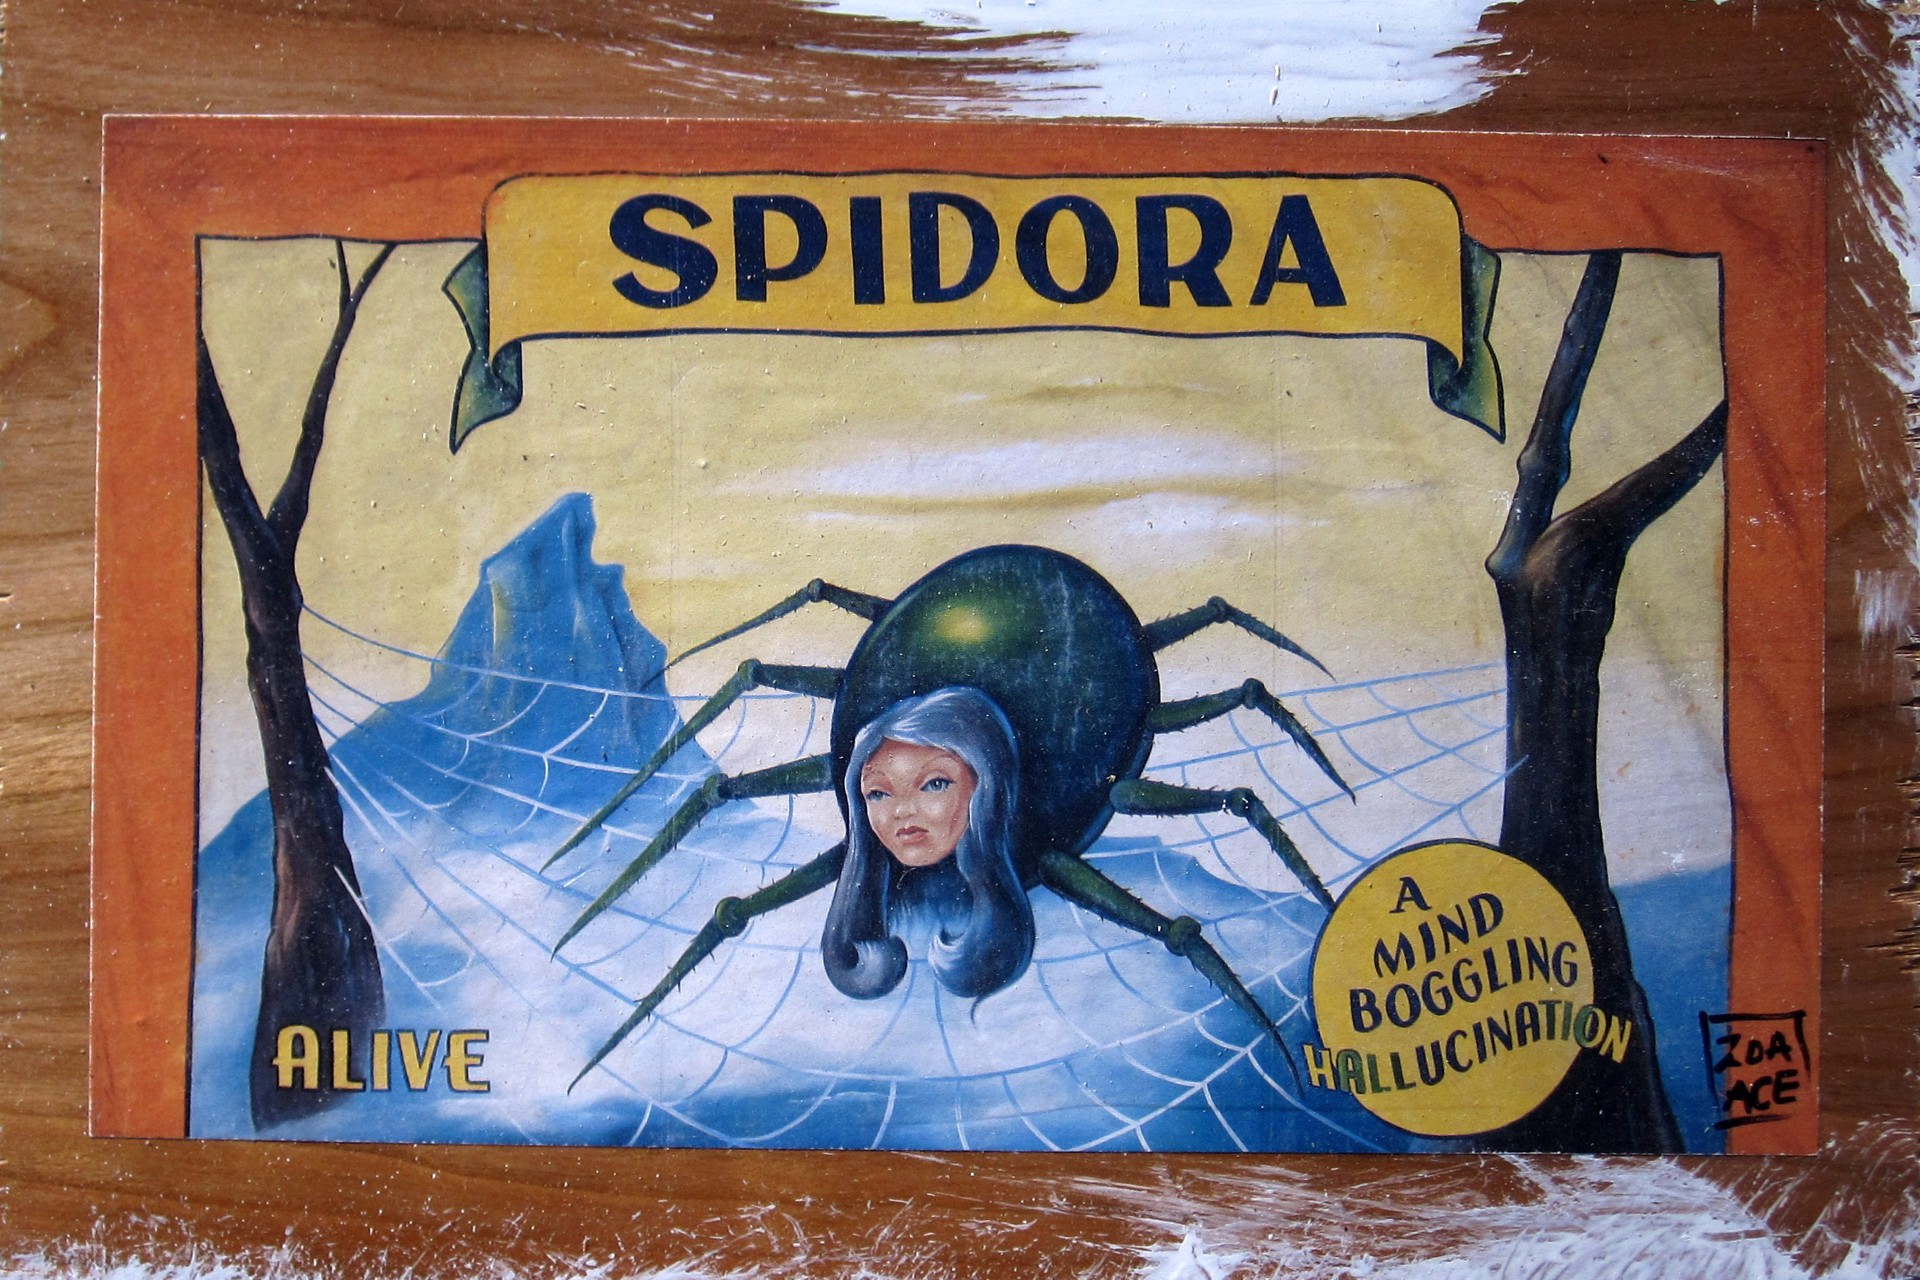 Spidora by Zoa Ace